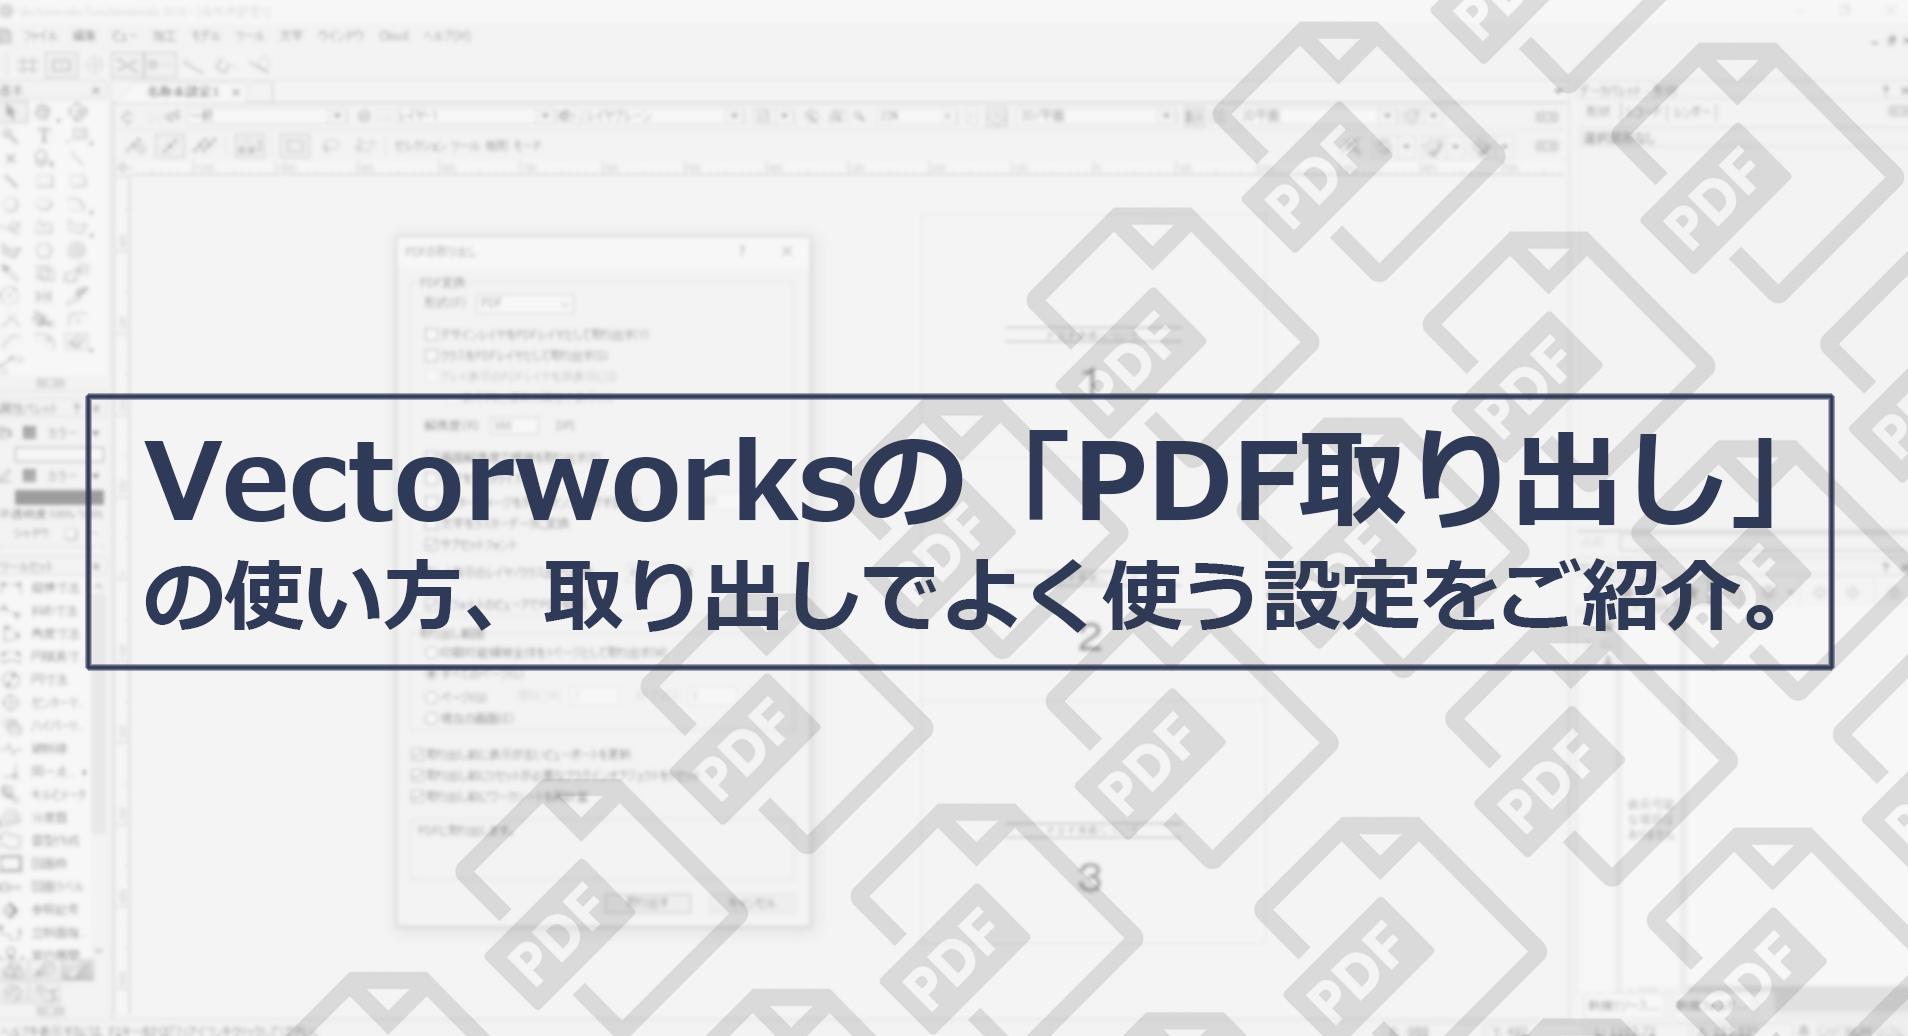 Vectorworksの「PDF取り出し」の使い方、取り出しでよく使う設定をご紹介。